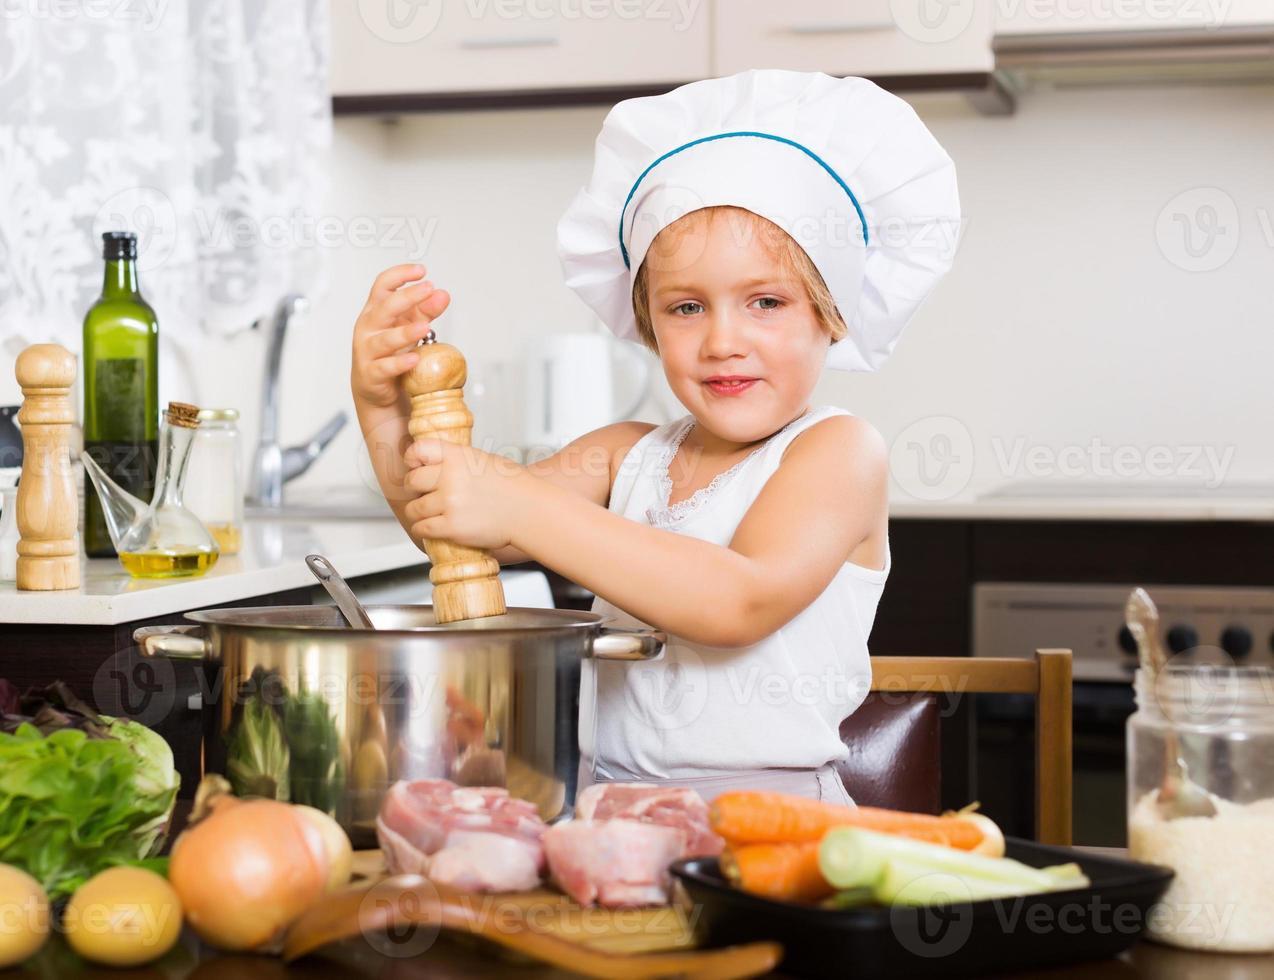 Kind kocht Suppe in der Pfanne foto